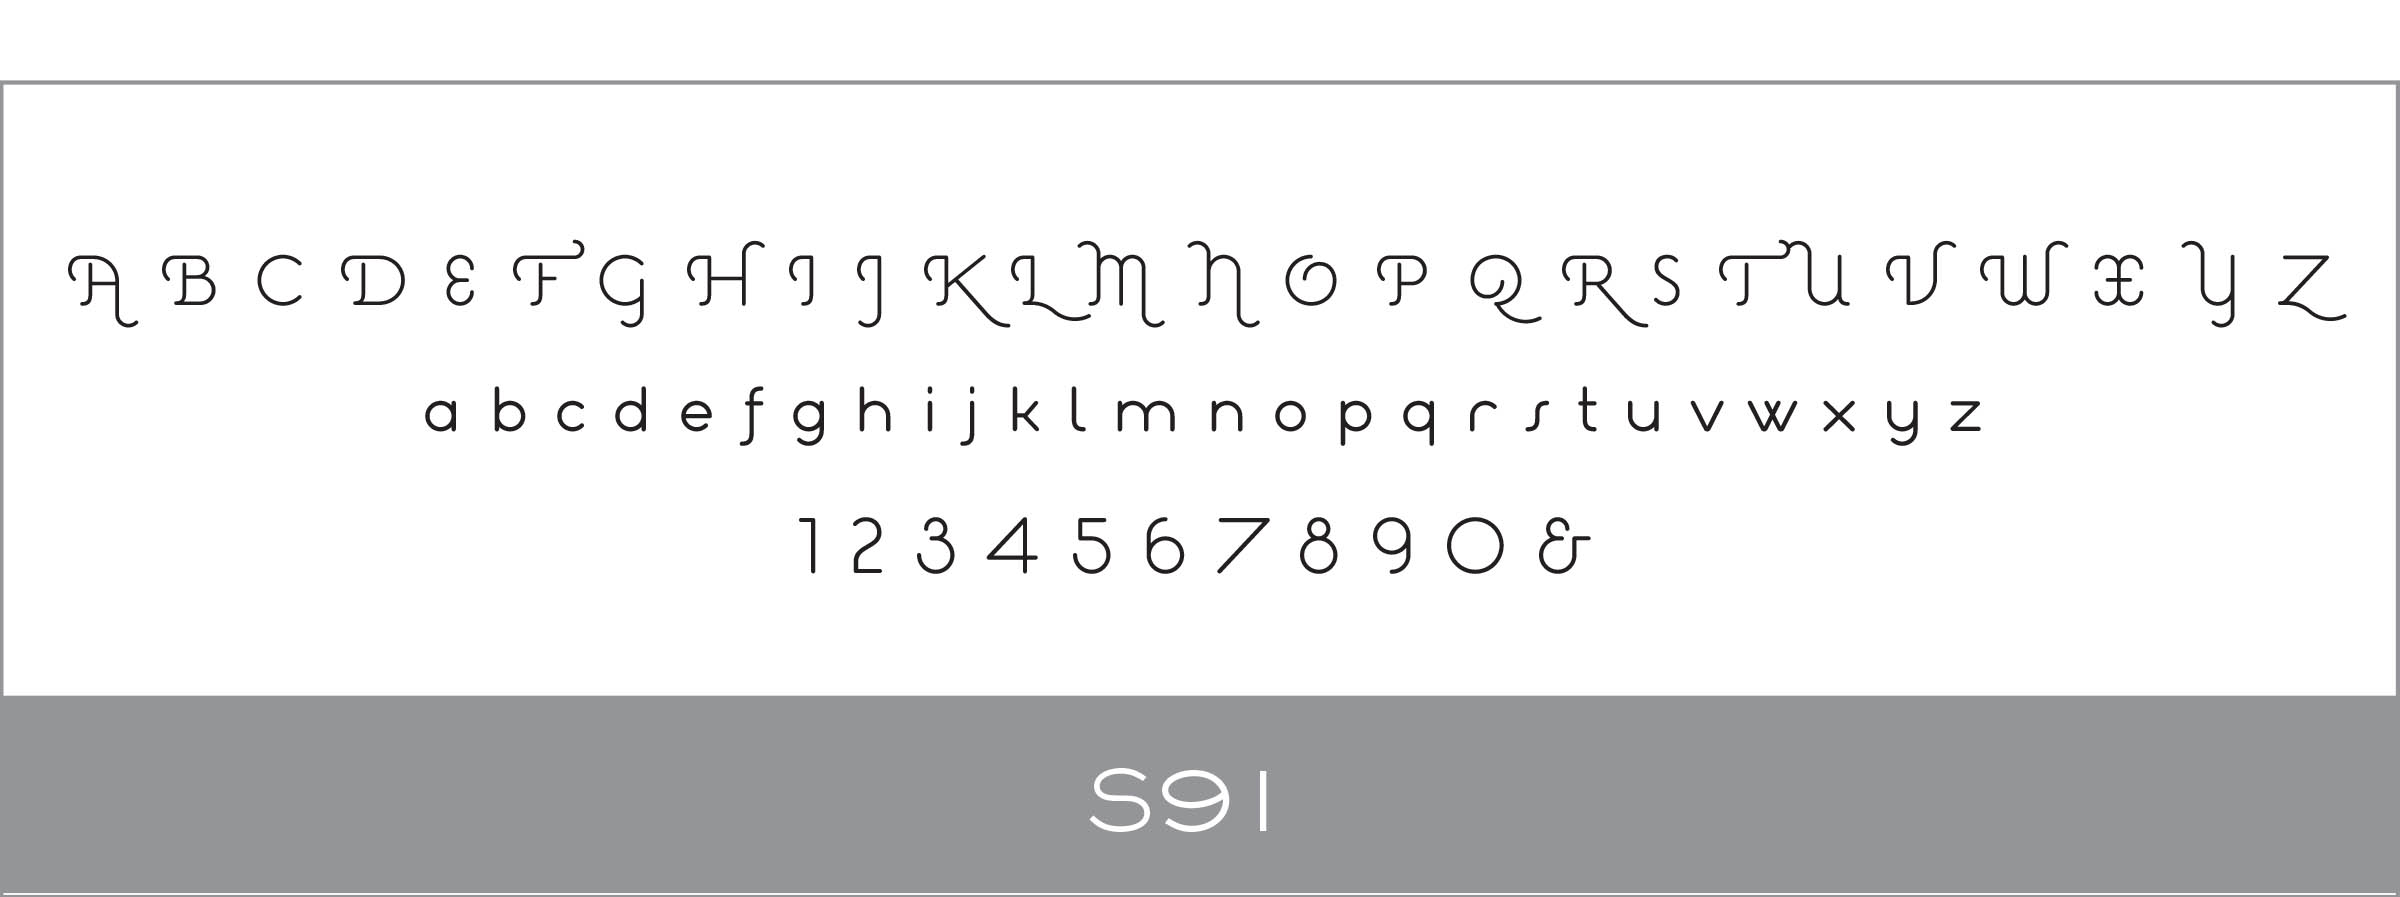 S91_Haute_Papier_Font.jpg